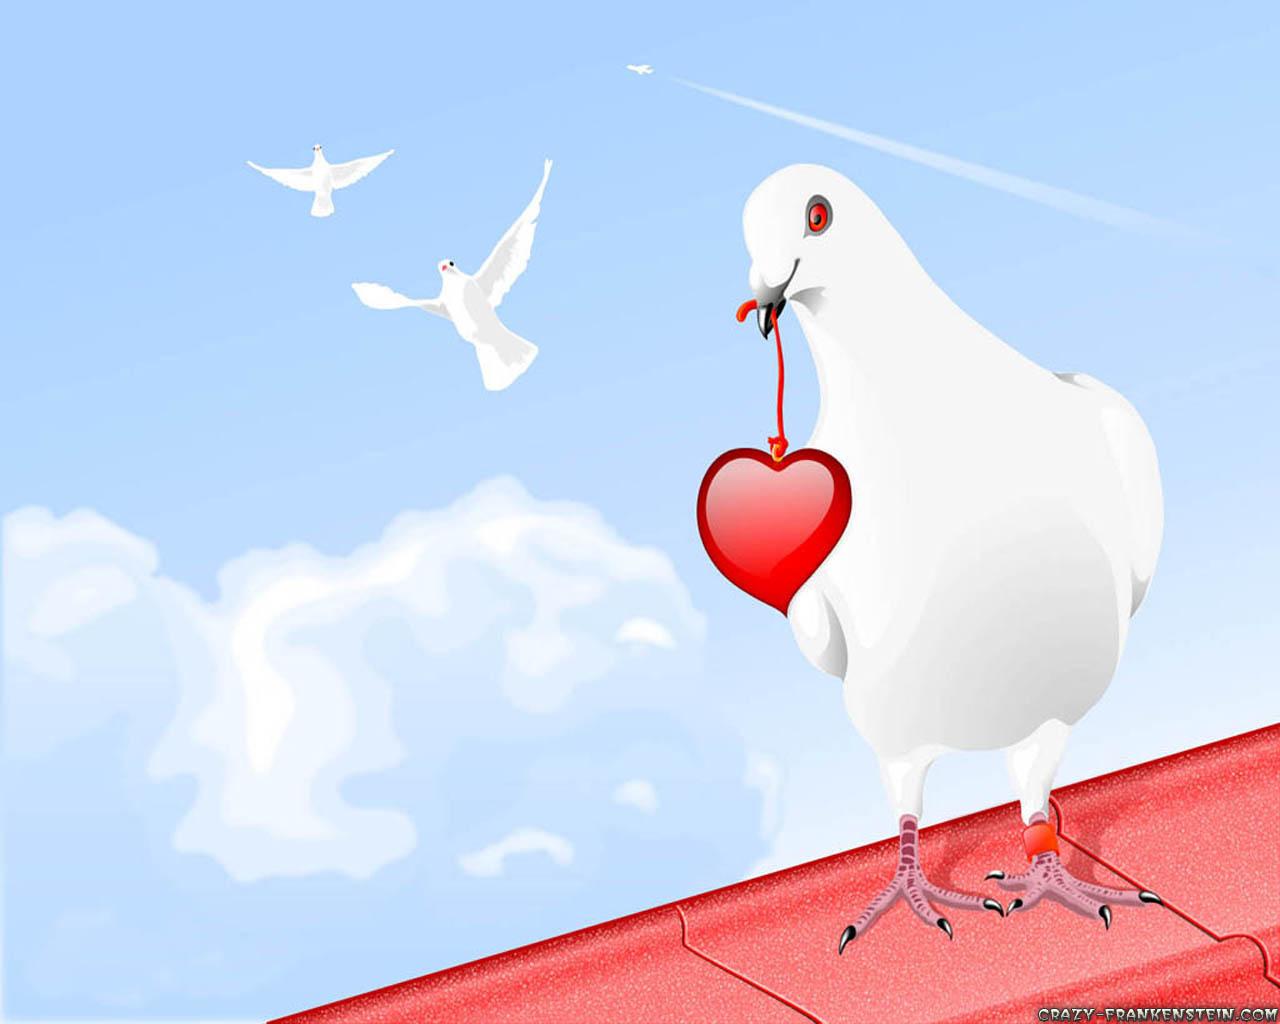 Wallpaper Gallery: Love Wallpaper - 33